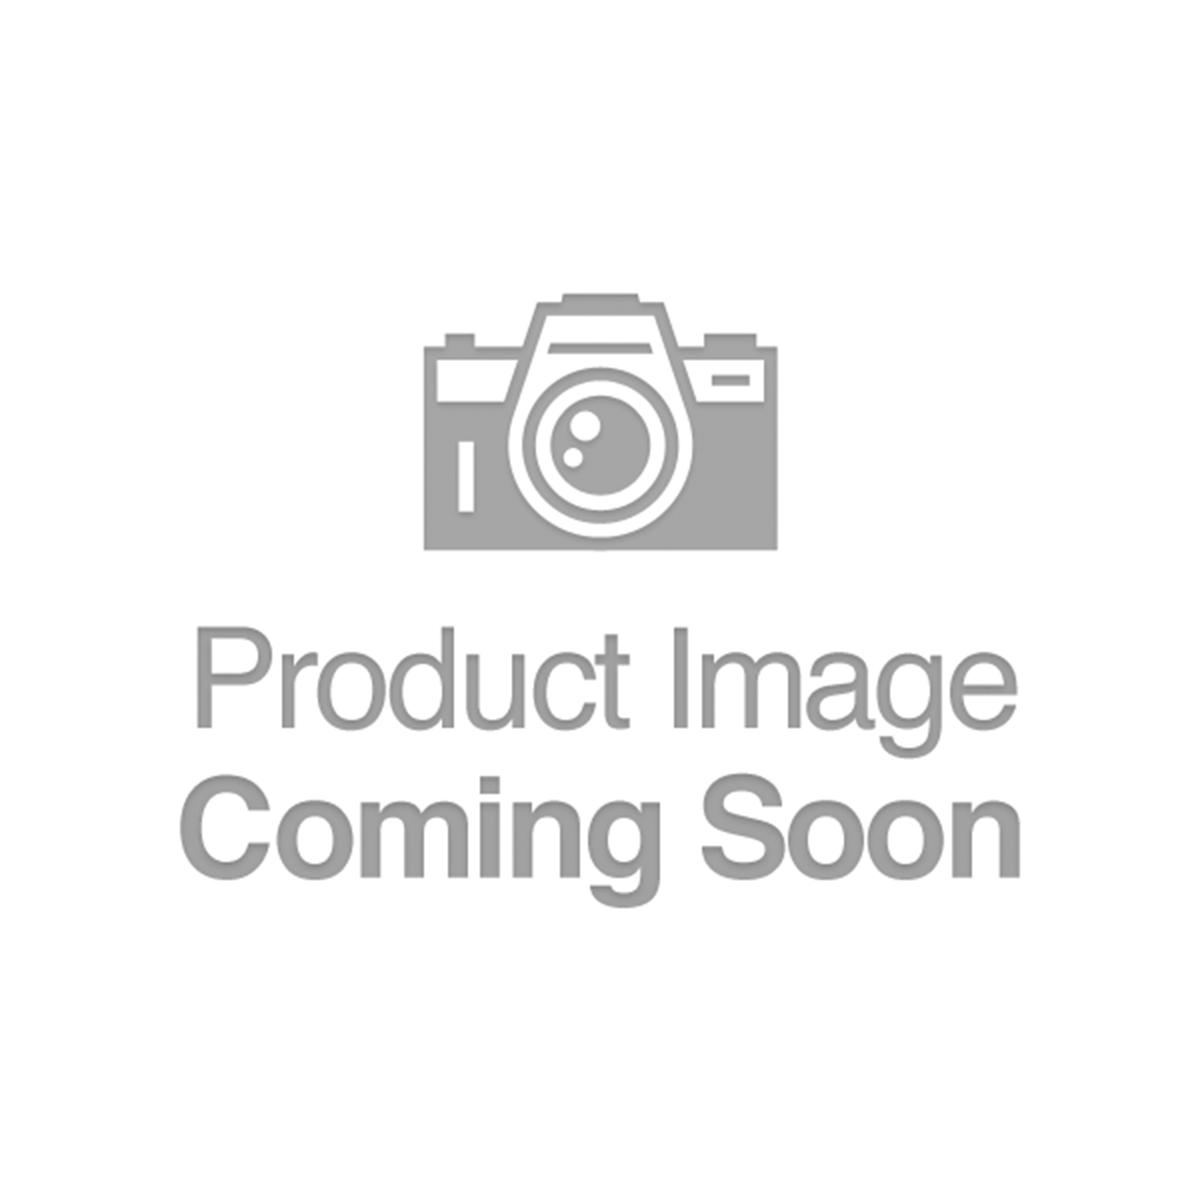 Lawton - Oklahoma - CH 5914 - FR 583 - PMG 30